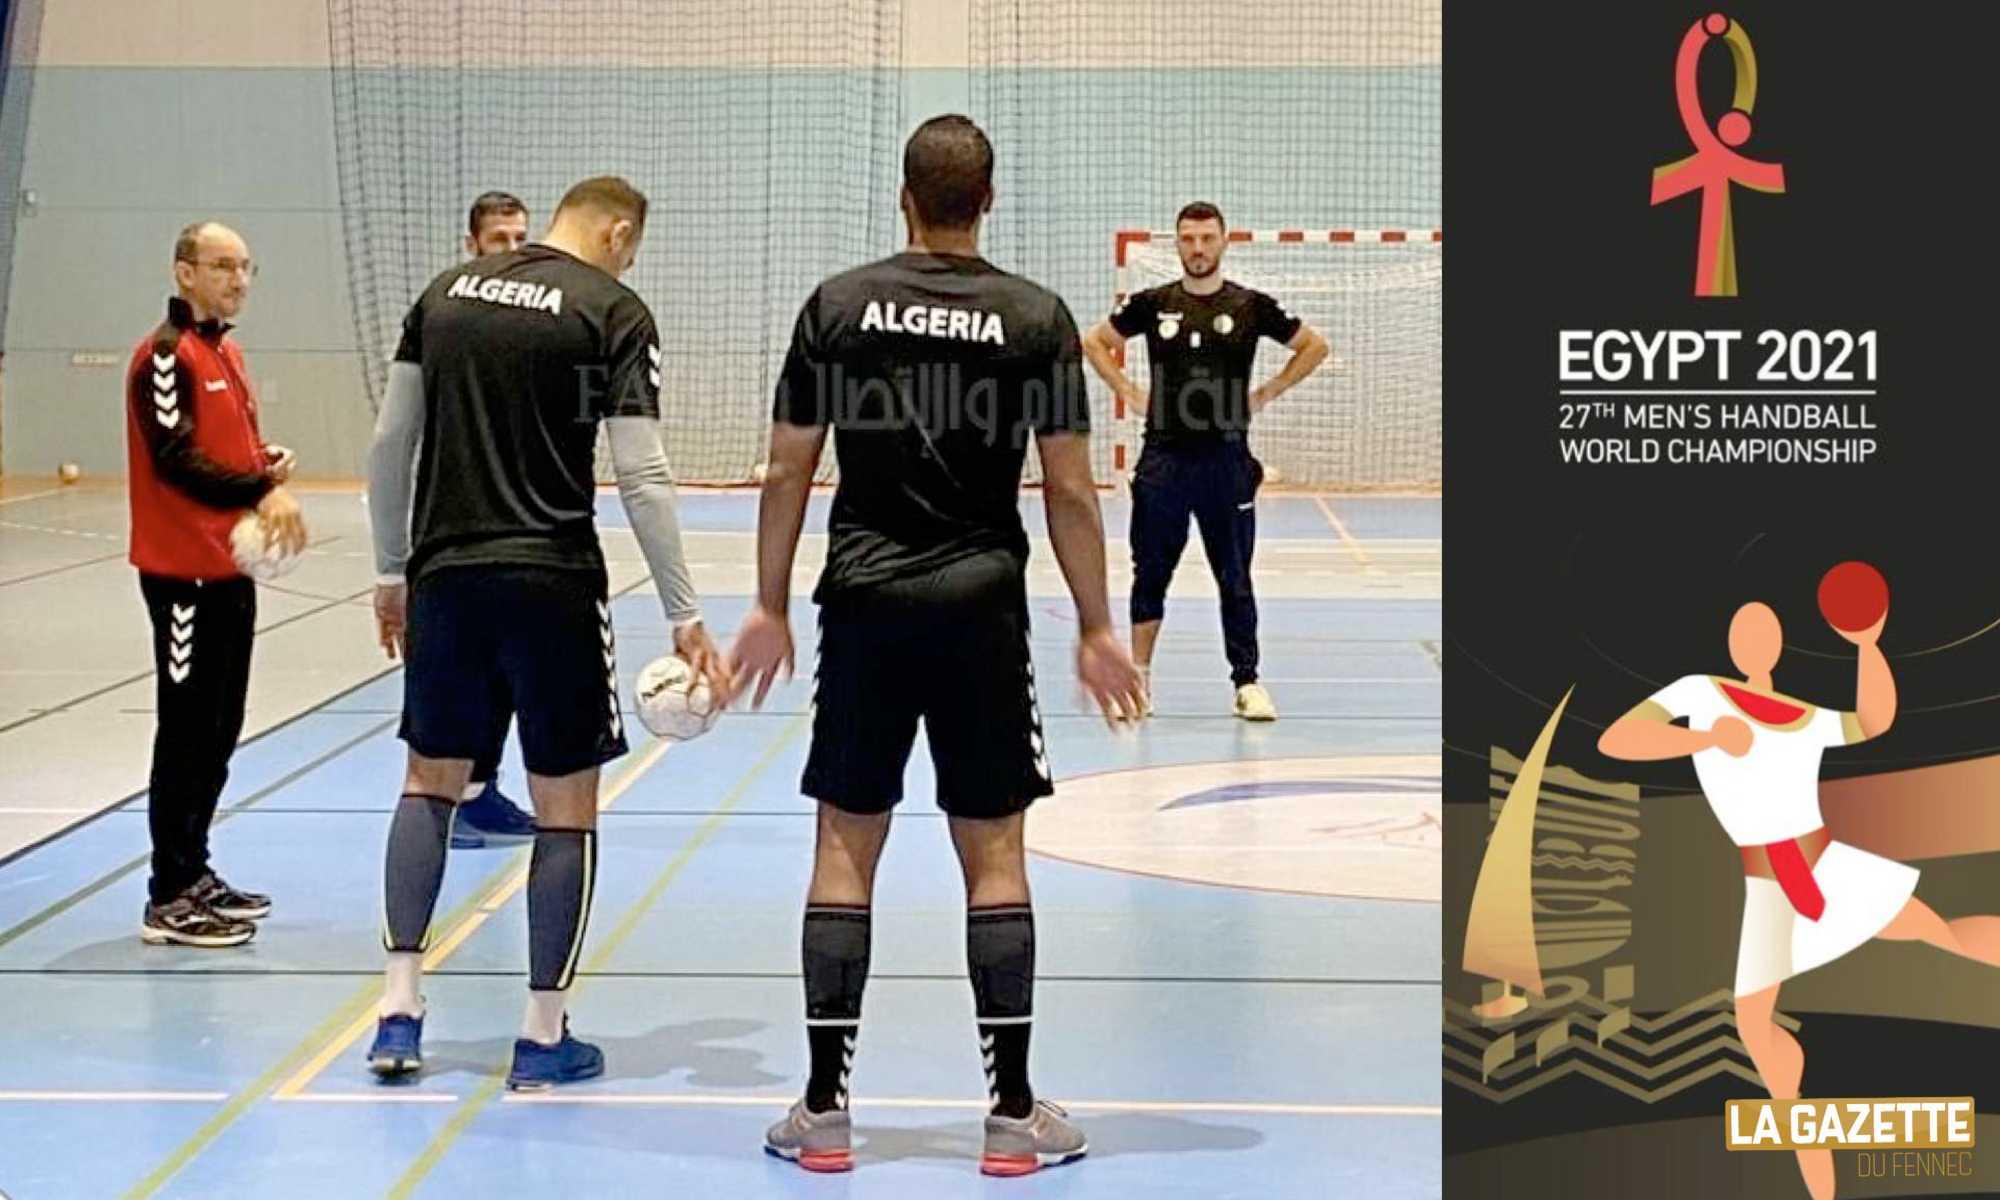 handball egypt 2021 alain porte stage